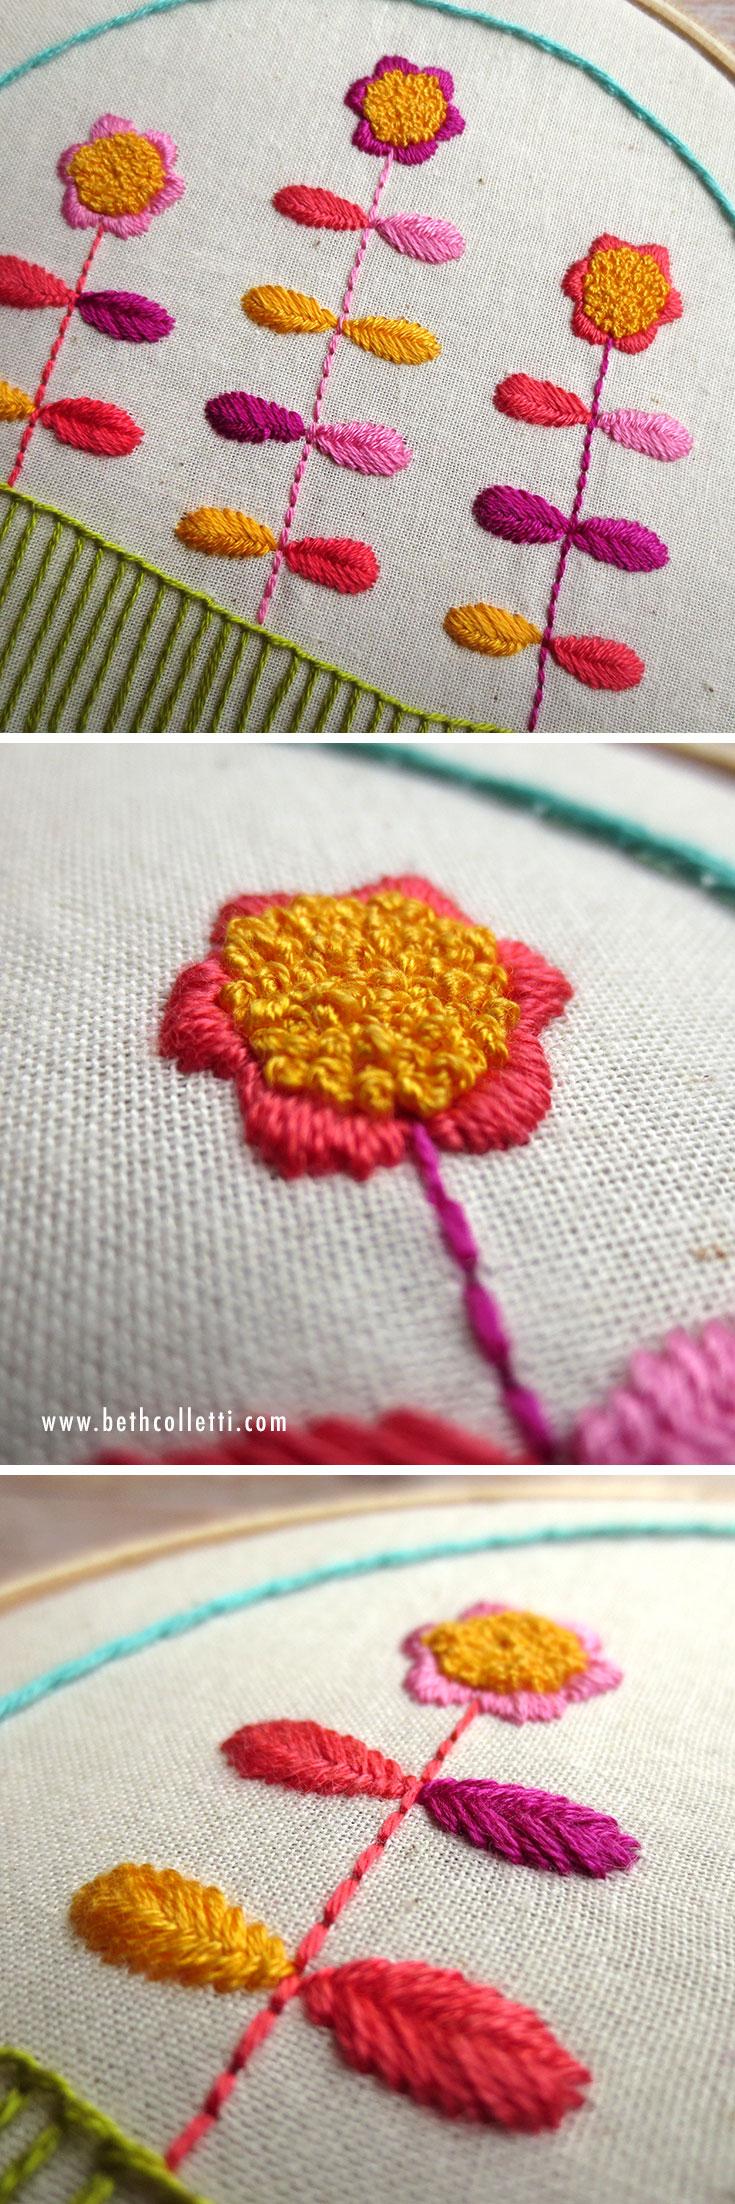 Beth_Colletti_Flower_Hill_Free_Pattern_02.jpg